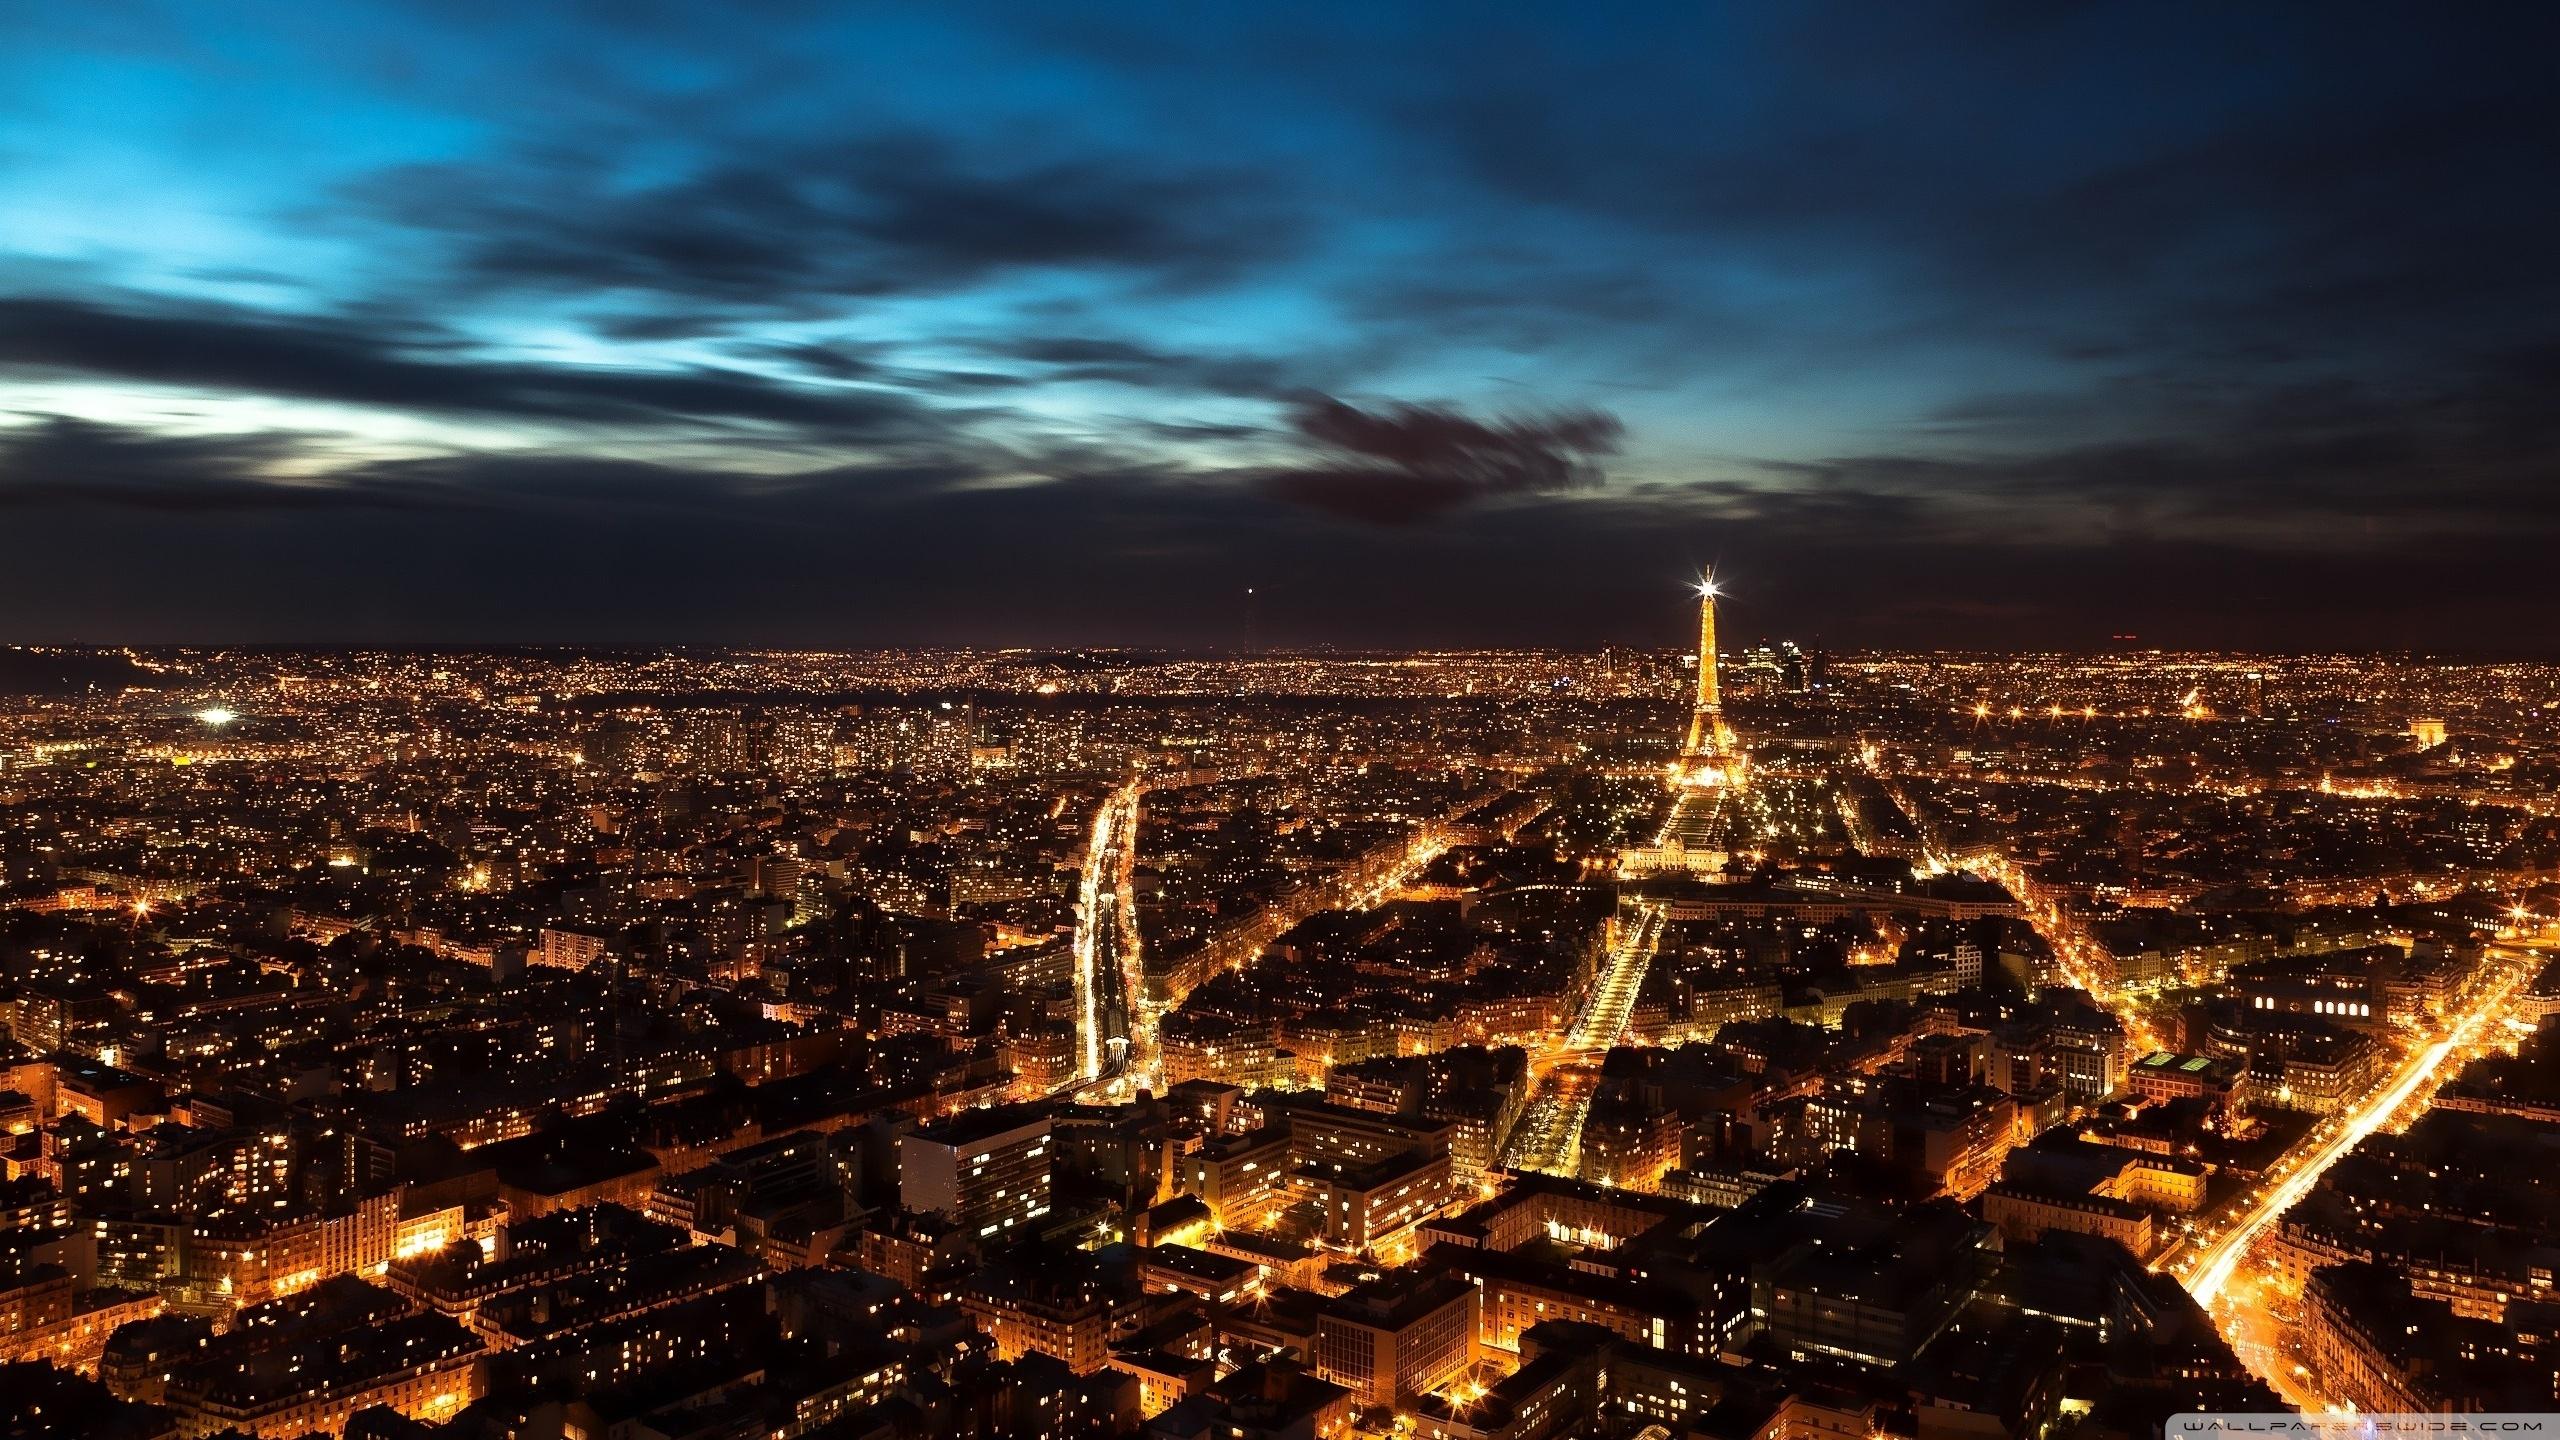 paris city lights ❤ 4k hd desktop wallpaper for 4k ultra hd tv